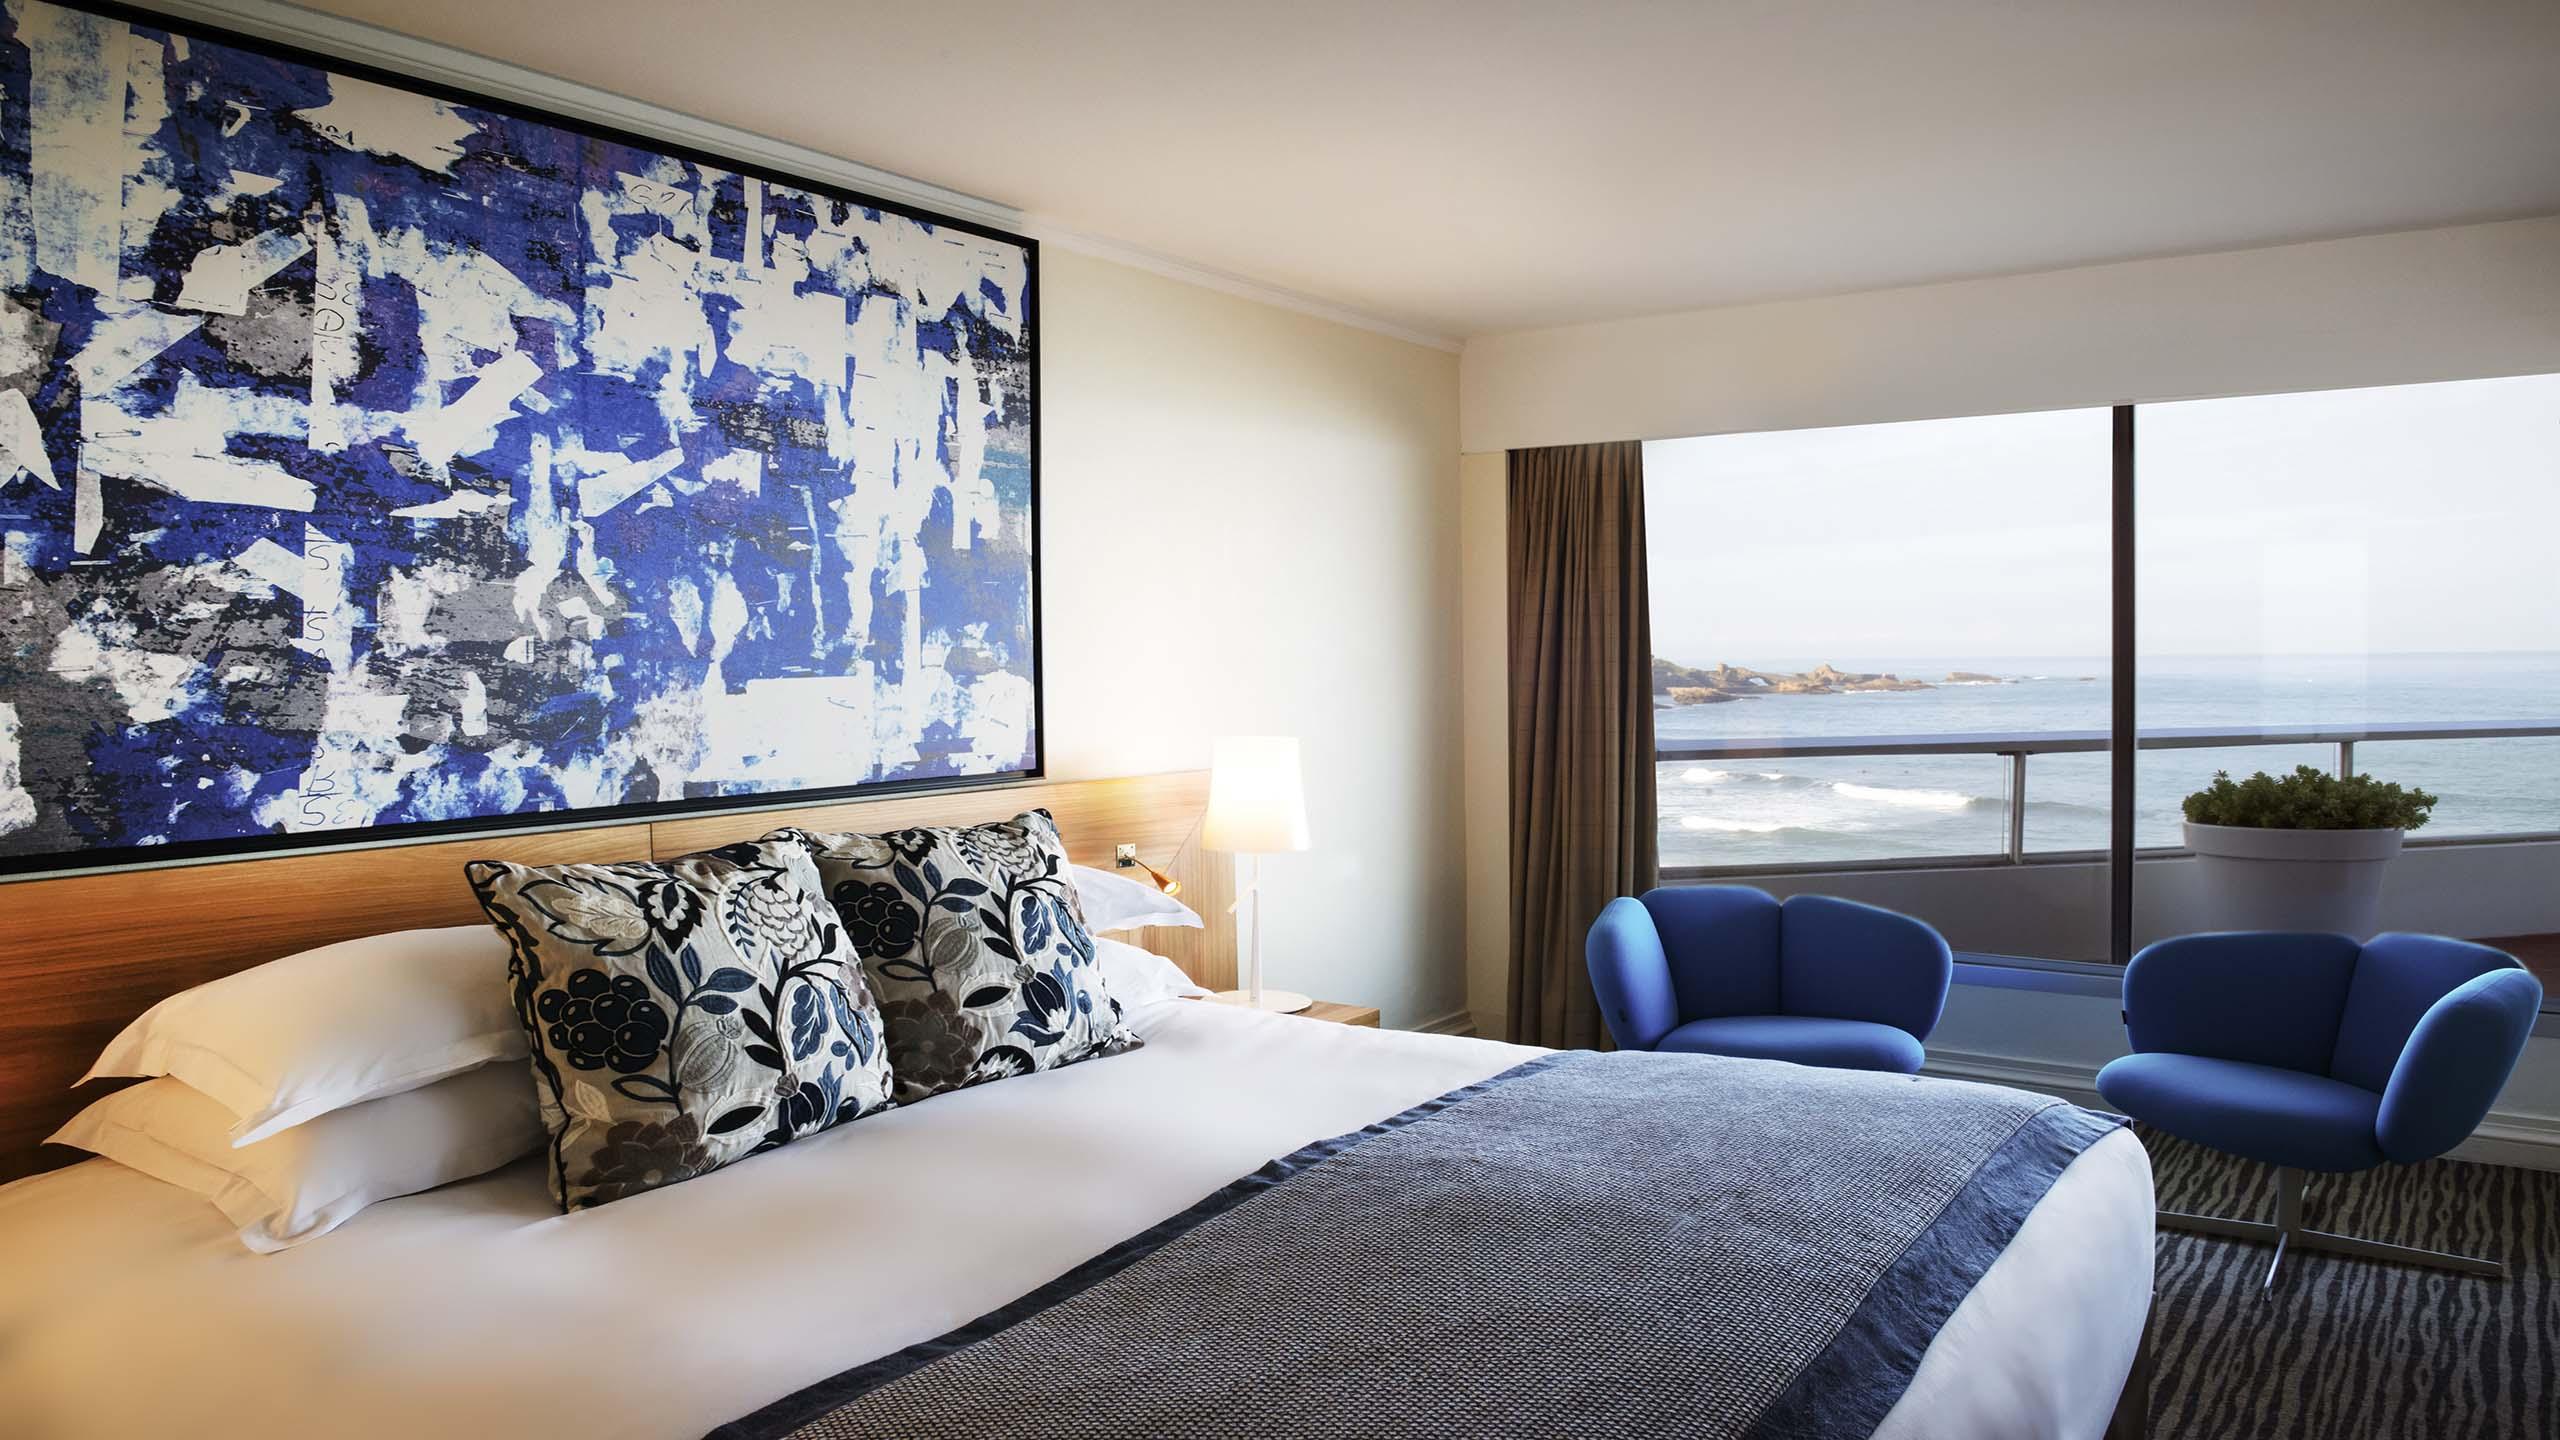 Luxury hotel BIARRITZ – Sofitel Biarritz le Miramar Thalassa Sea & Spa